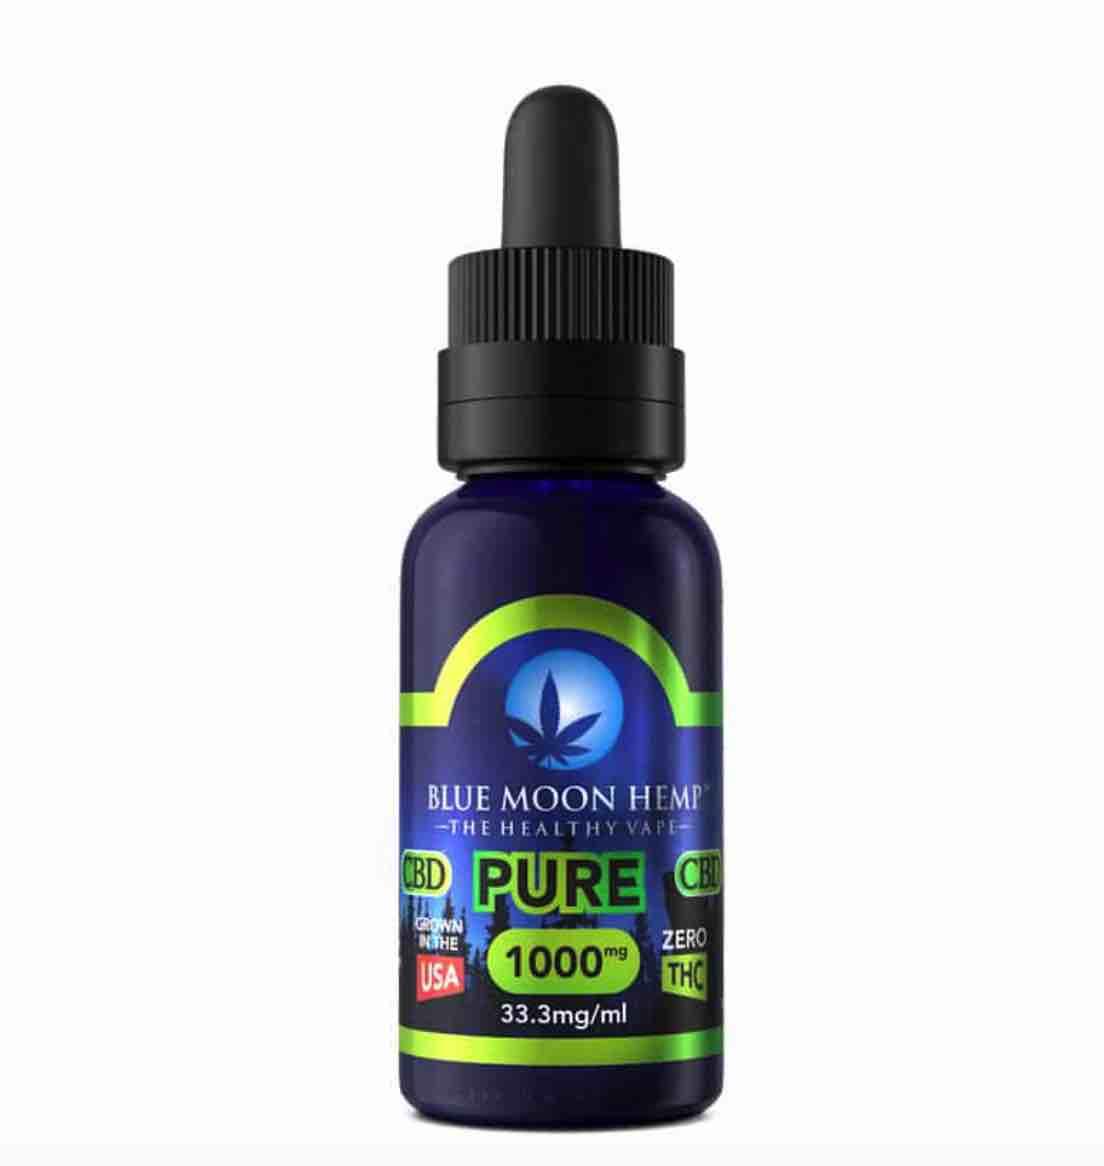 Pure And Strongest CBD Vape Oil